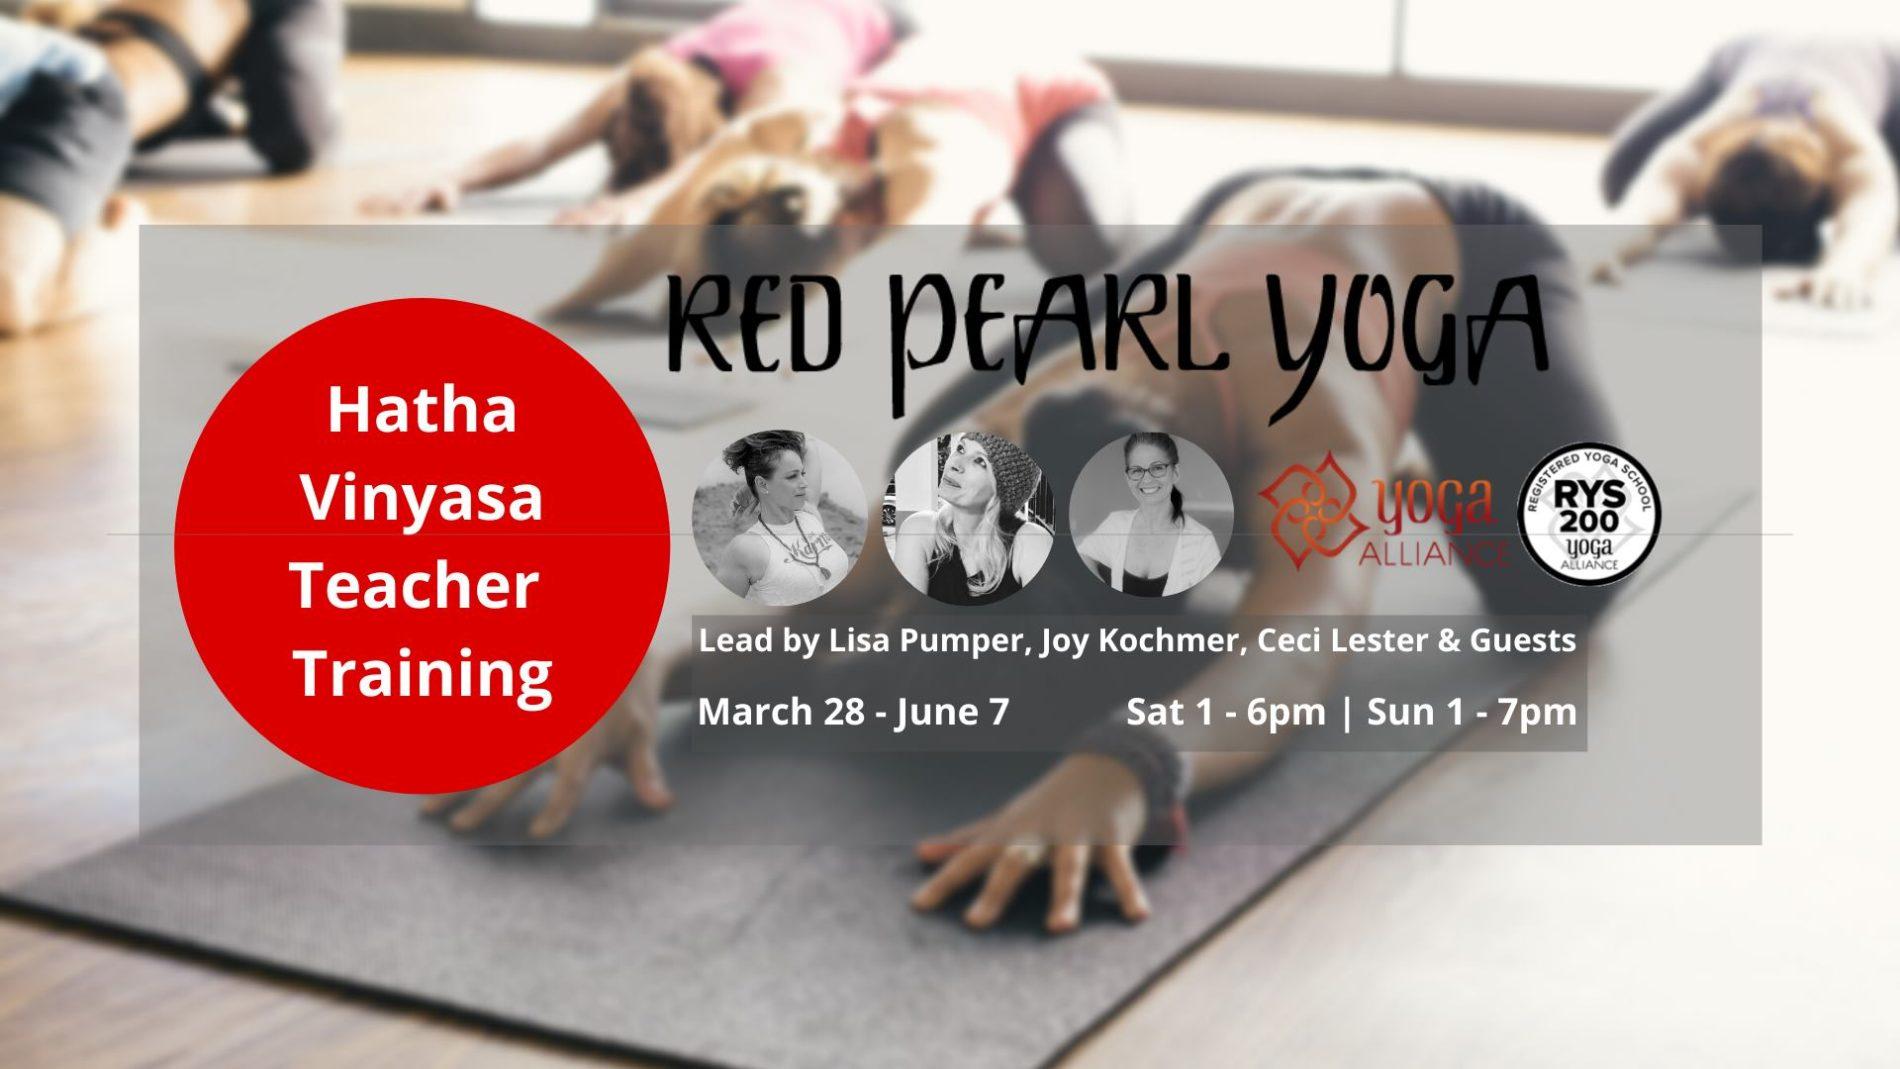 yoga teacher training, florida, fort lauderdale, wilton manors, miami, west palm beach, red pearl yoga, lisa pumper, joy michelle, om joyful yoga, yoga, meditation, yoga teacher